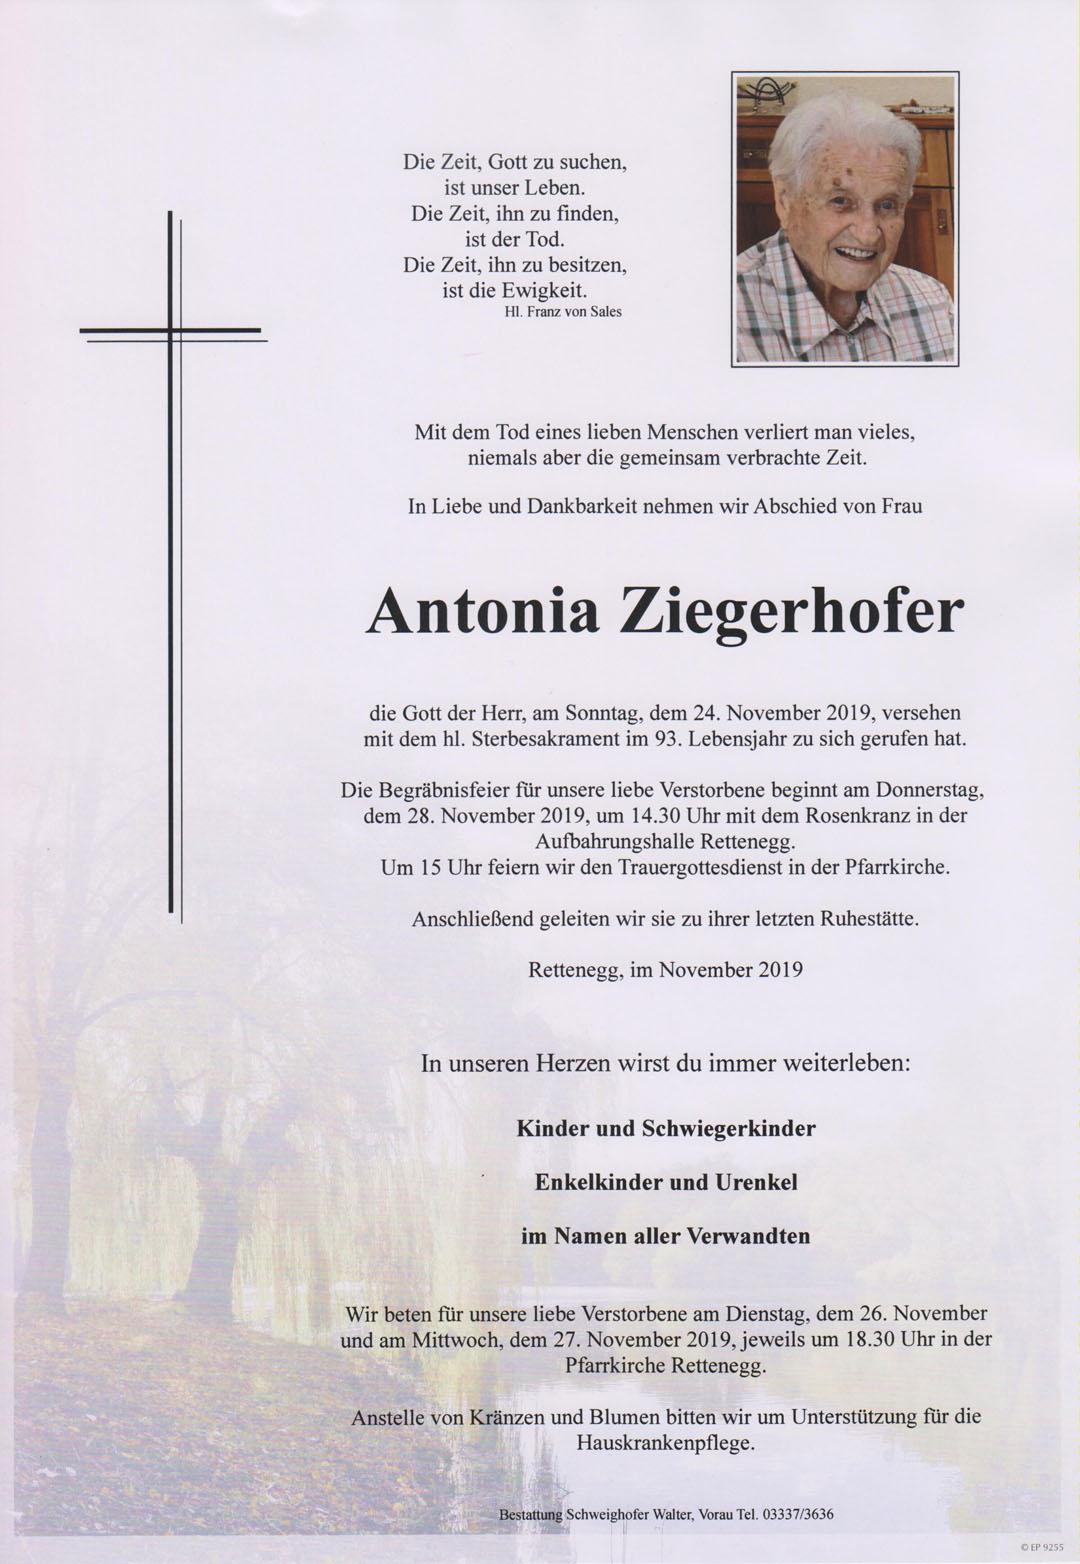 Antonia Ziegerhofer